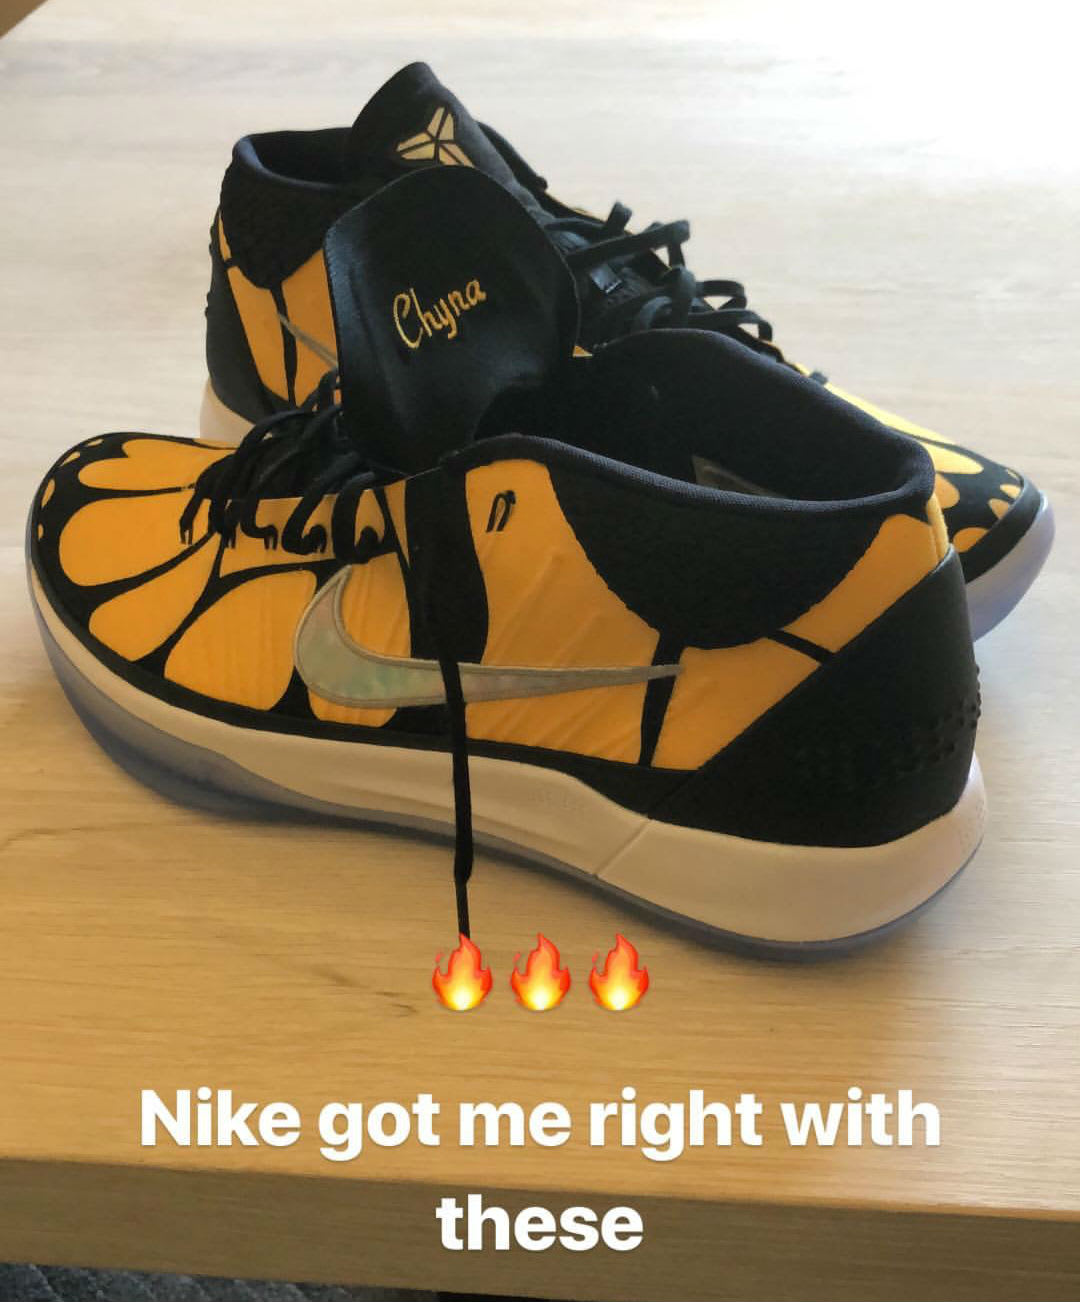 Isaiah Thomas Nike Kobe A.D. Chyna Heel